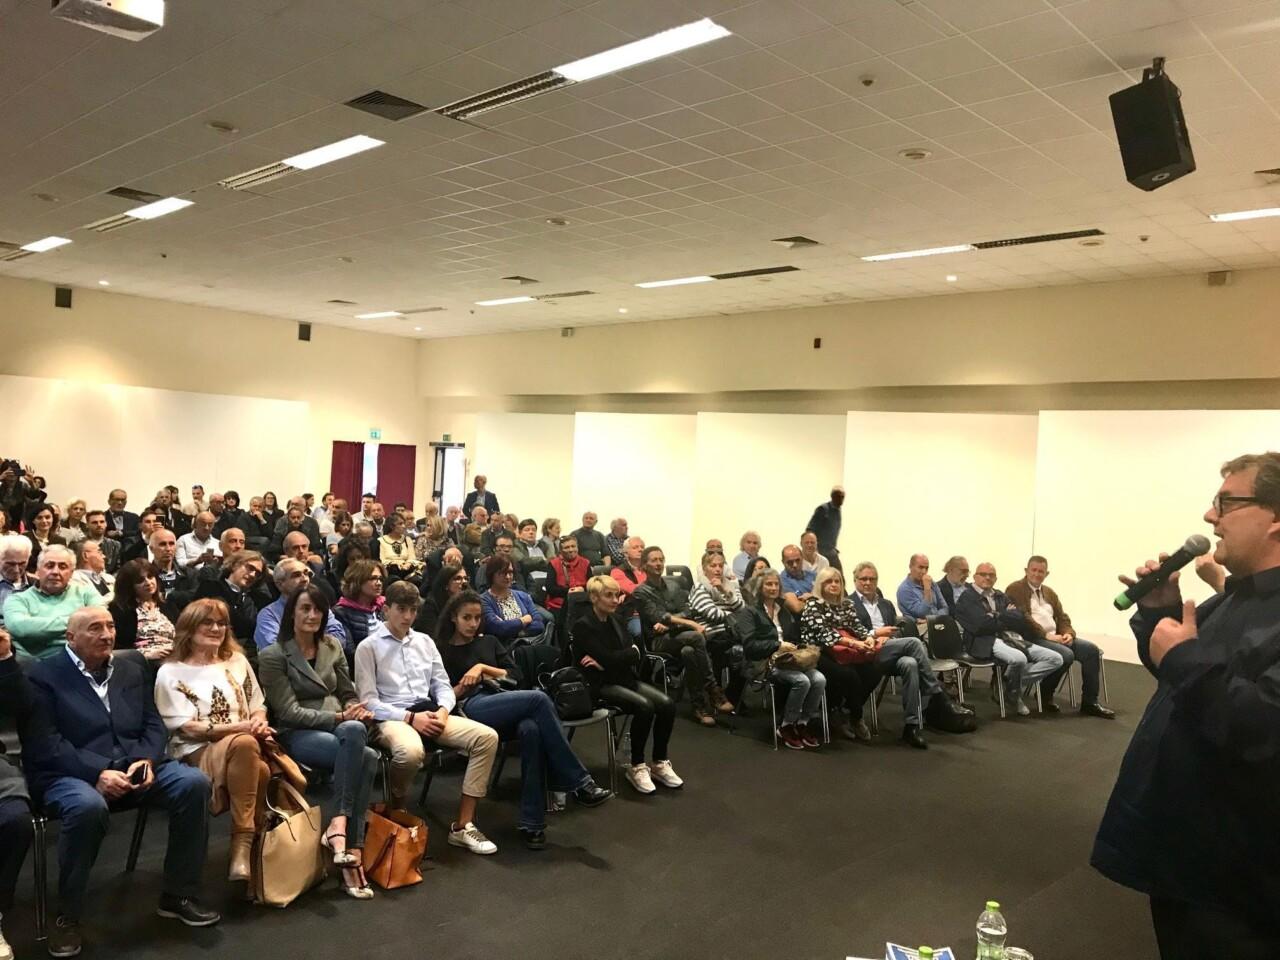 Coalizione Civica Ricci Presidente, oltre 700 a Umbria Fiere